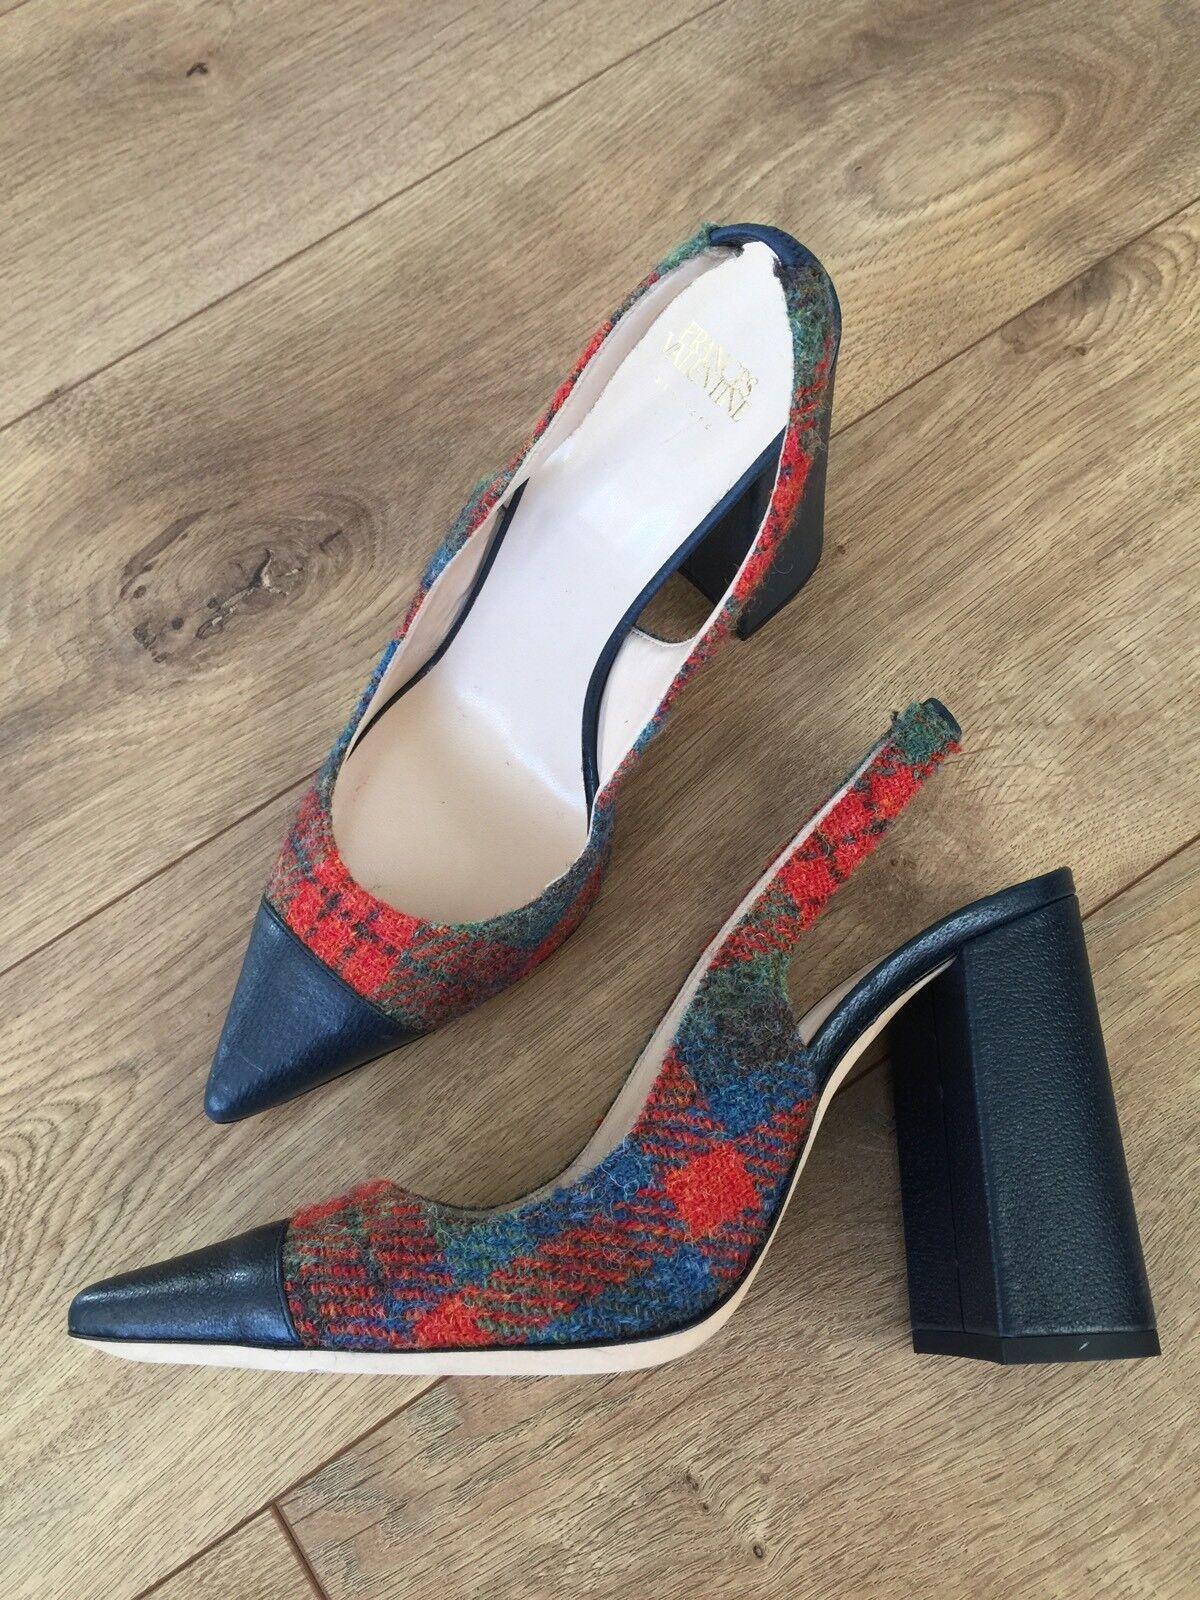 New Frances Valentine Sandy Slingback Wool Leather Pump Heels Multi 8  465 RARE!